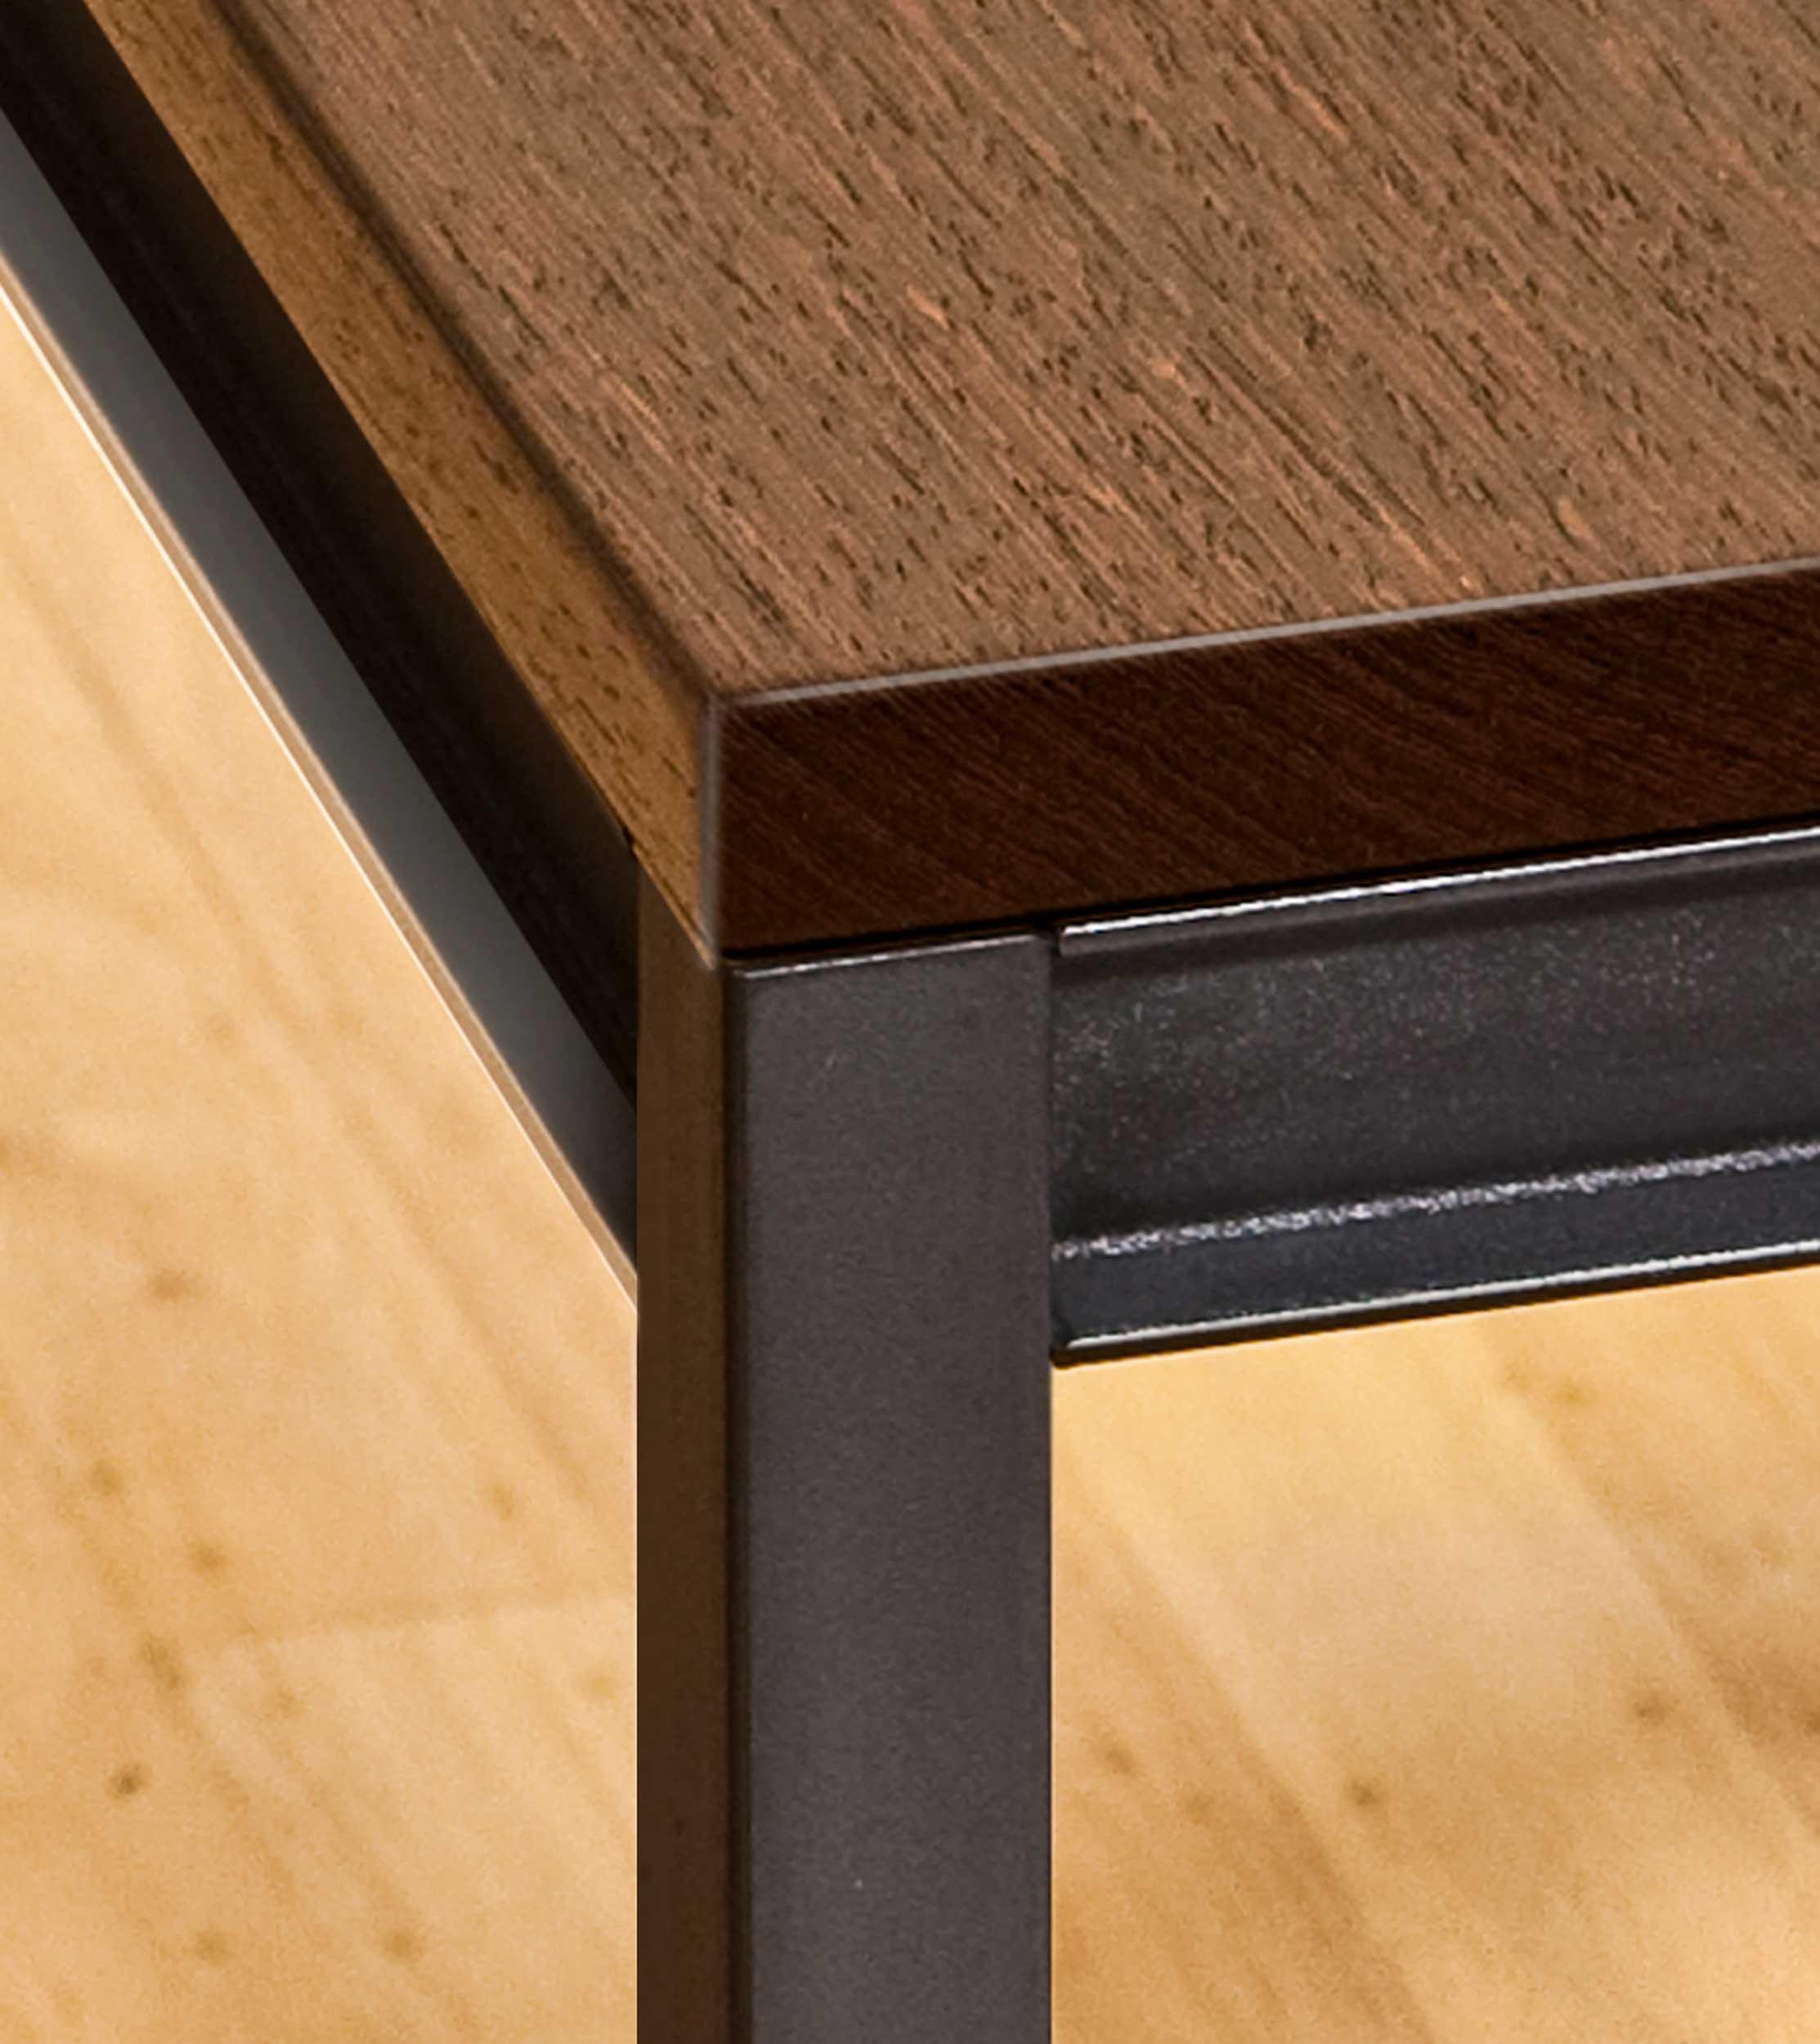 29-Desk_End-3.jpg